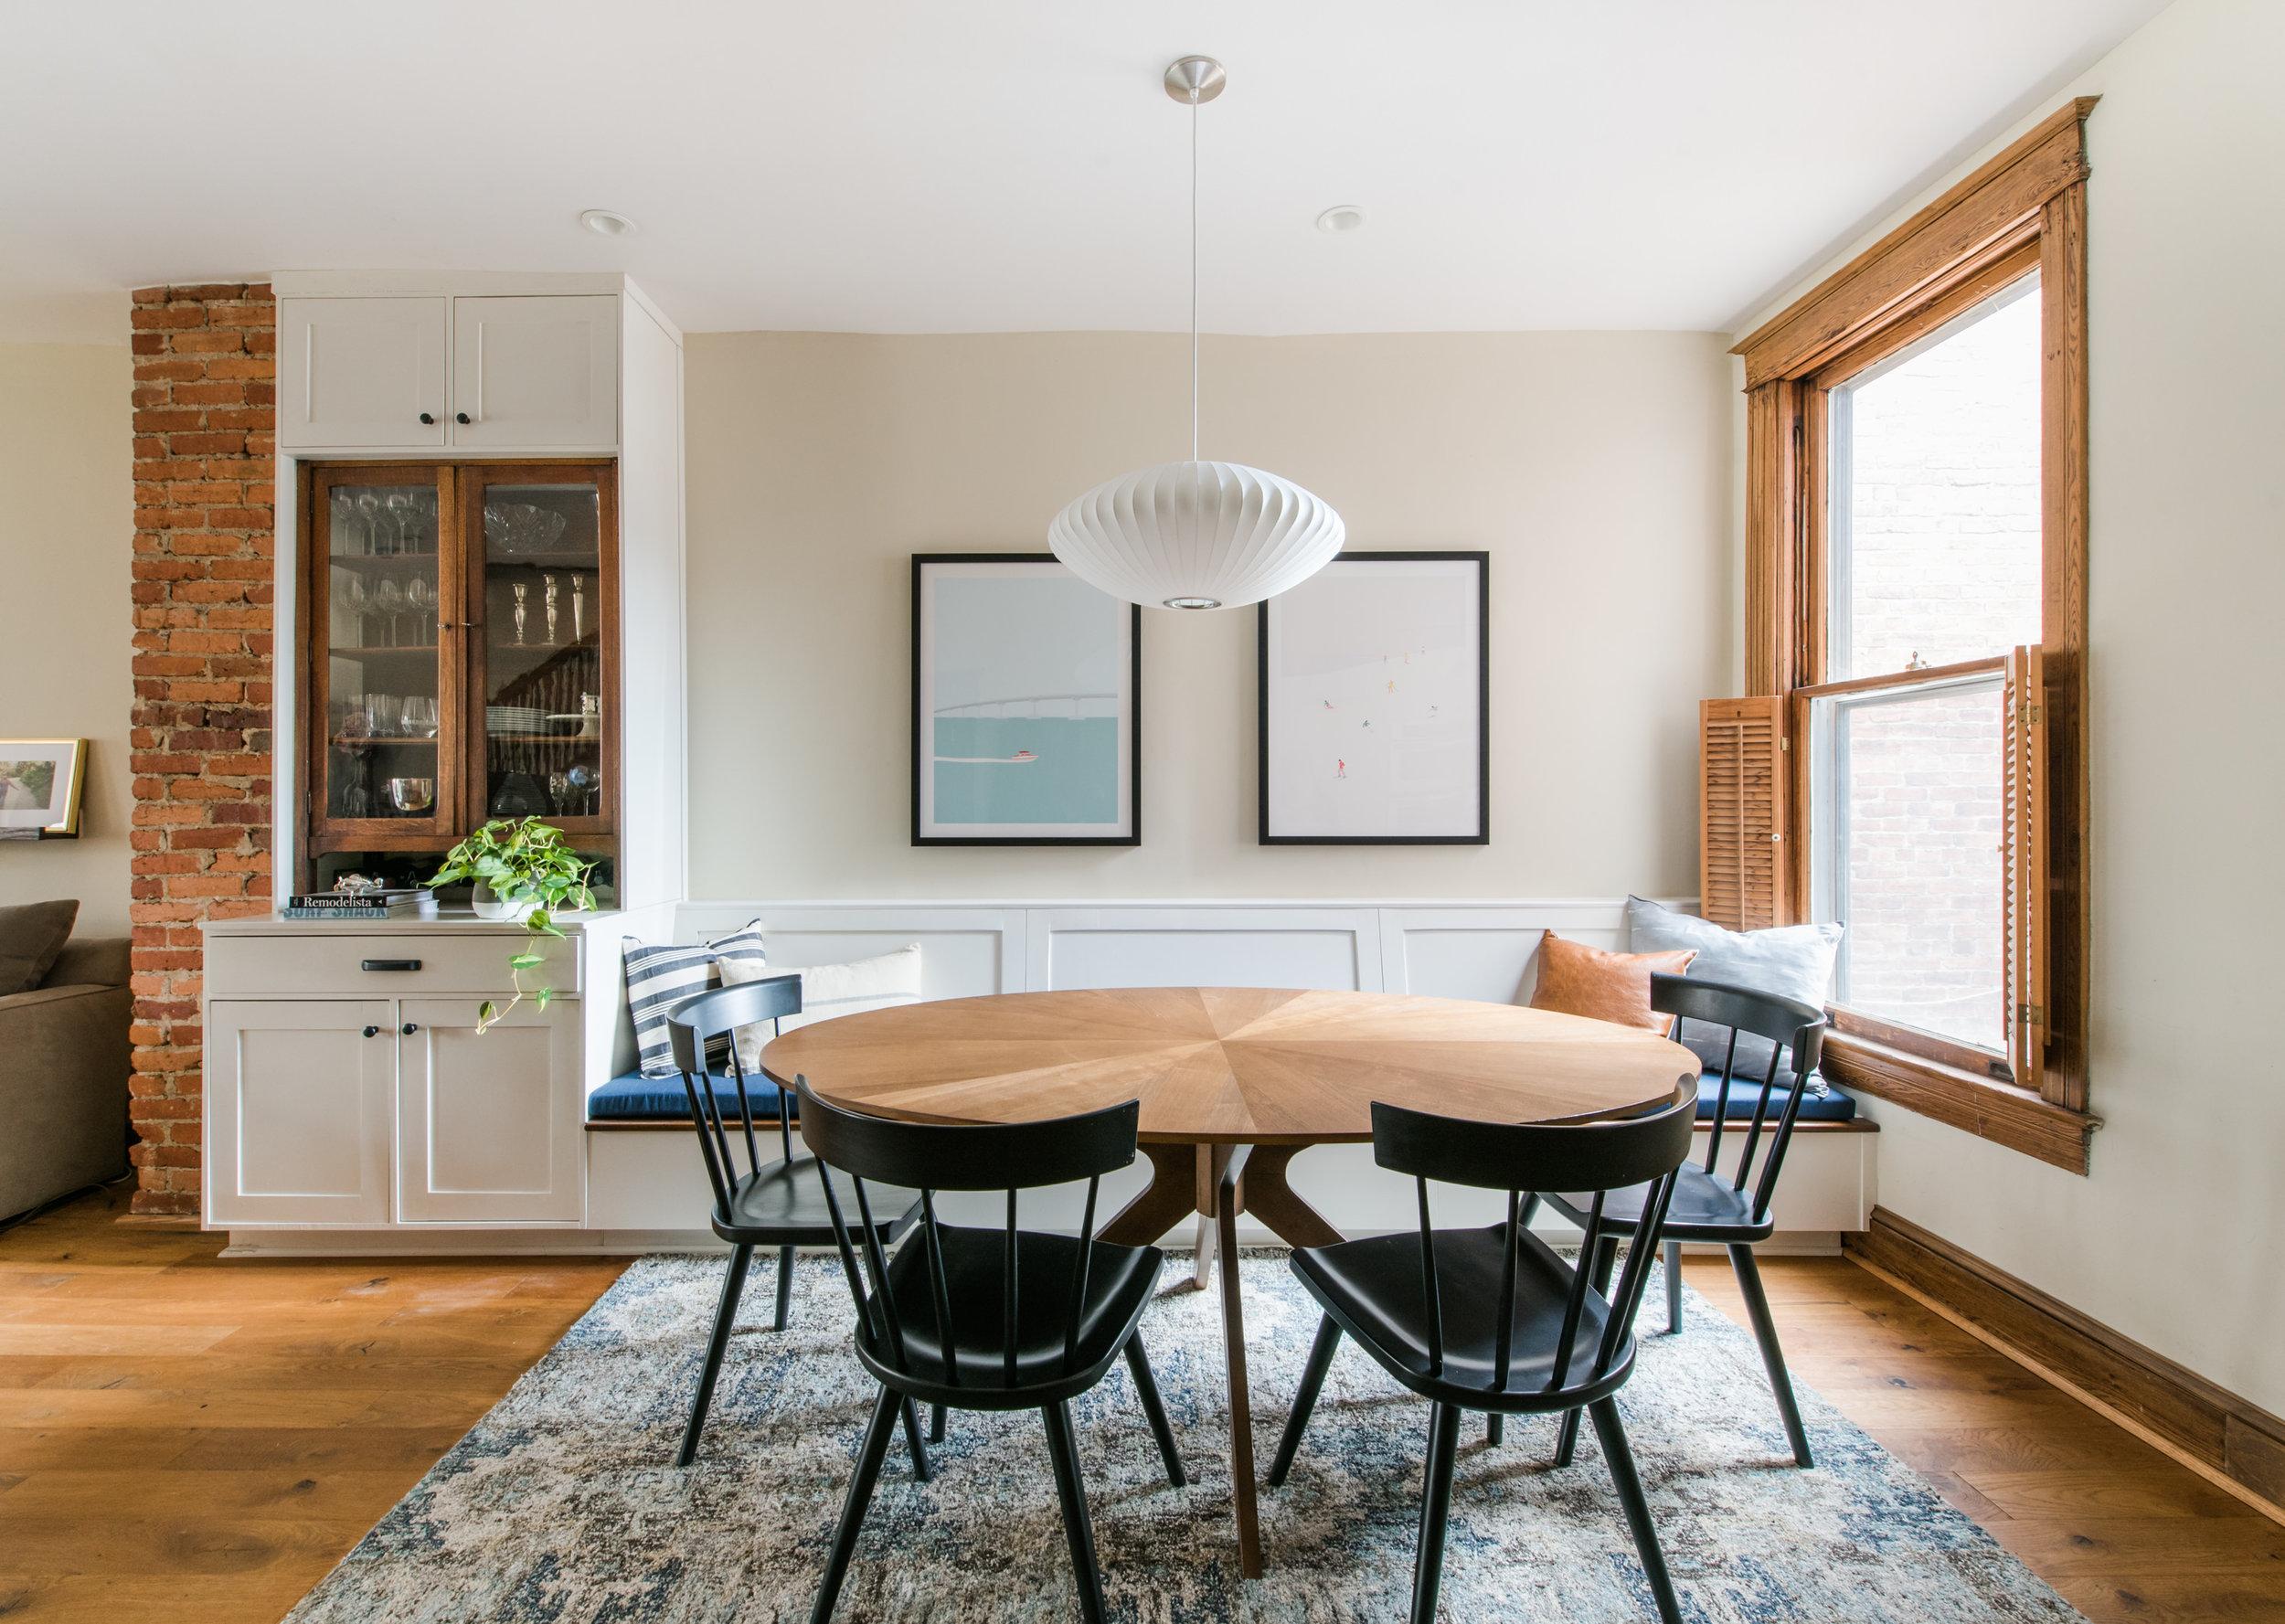 north-carolina-ave-washington-dc-dining-room-renovation-sanabria-and-co-interior-design-studio-02.jpg